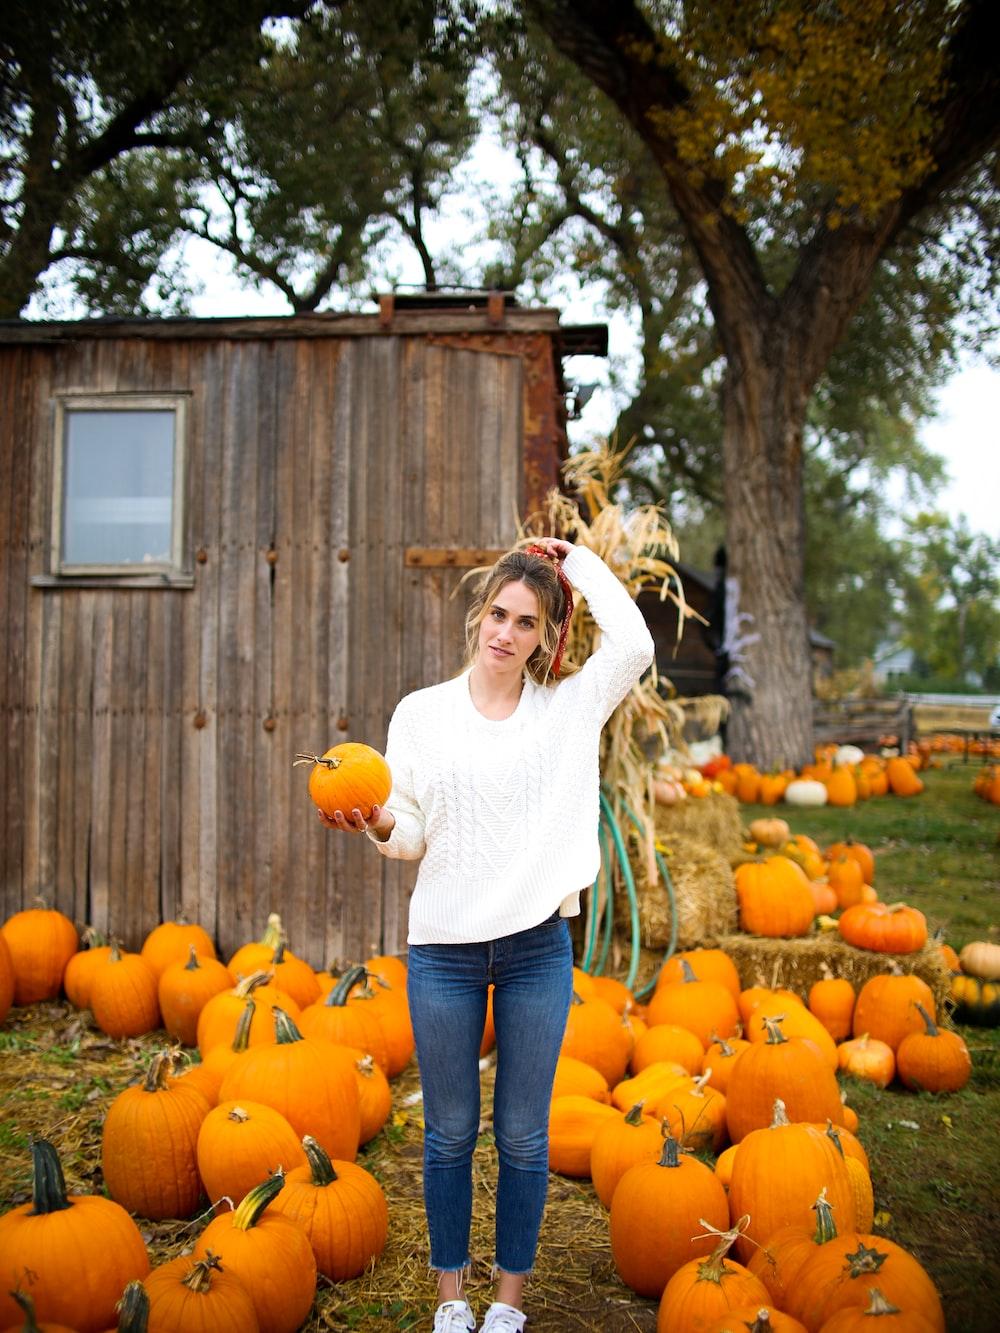 woman carrying orange pumpkin